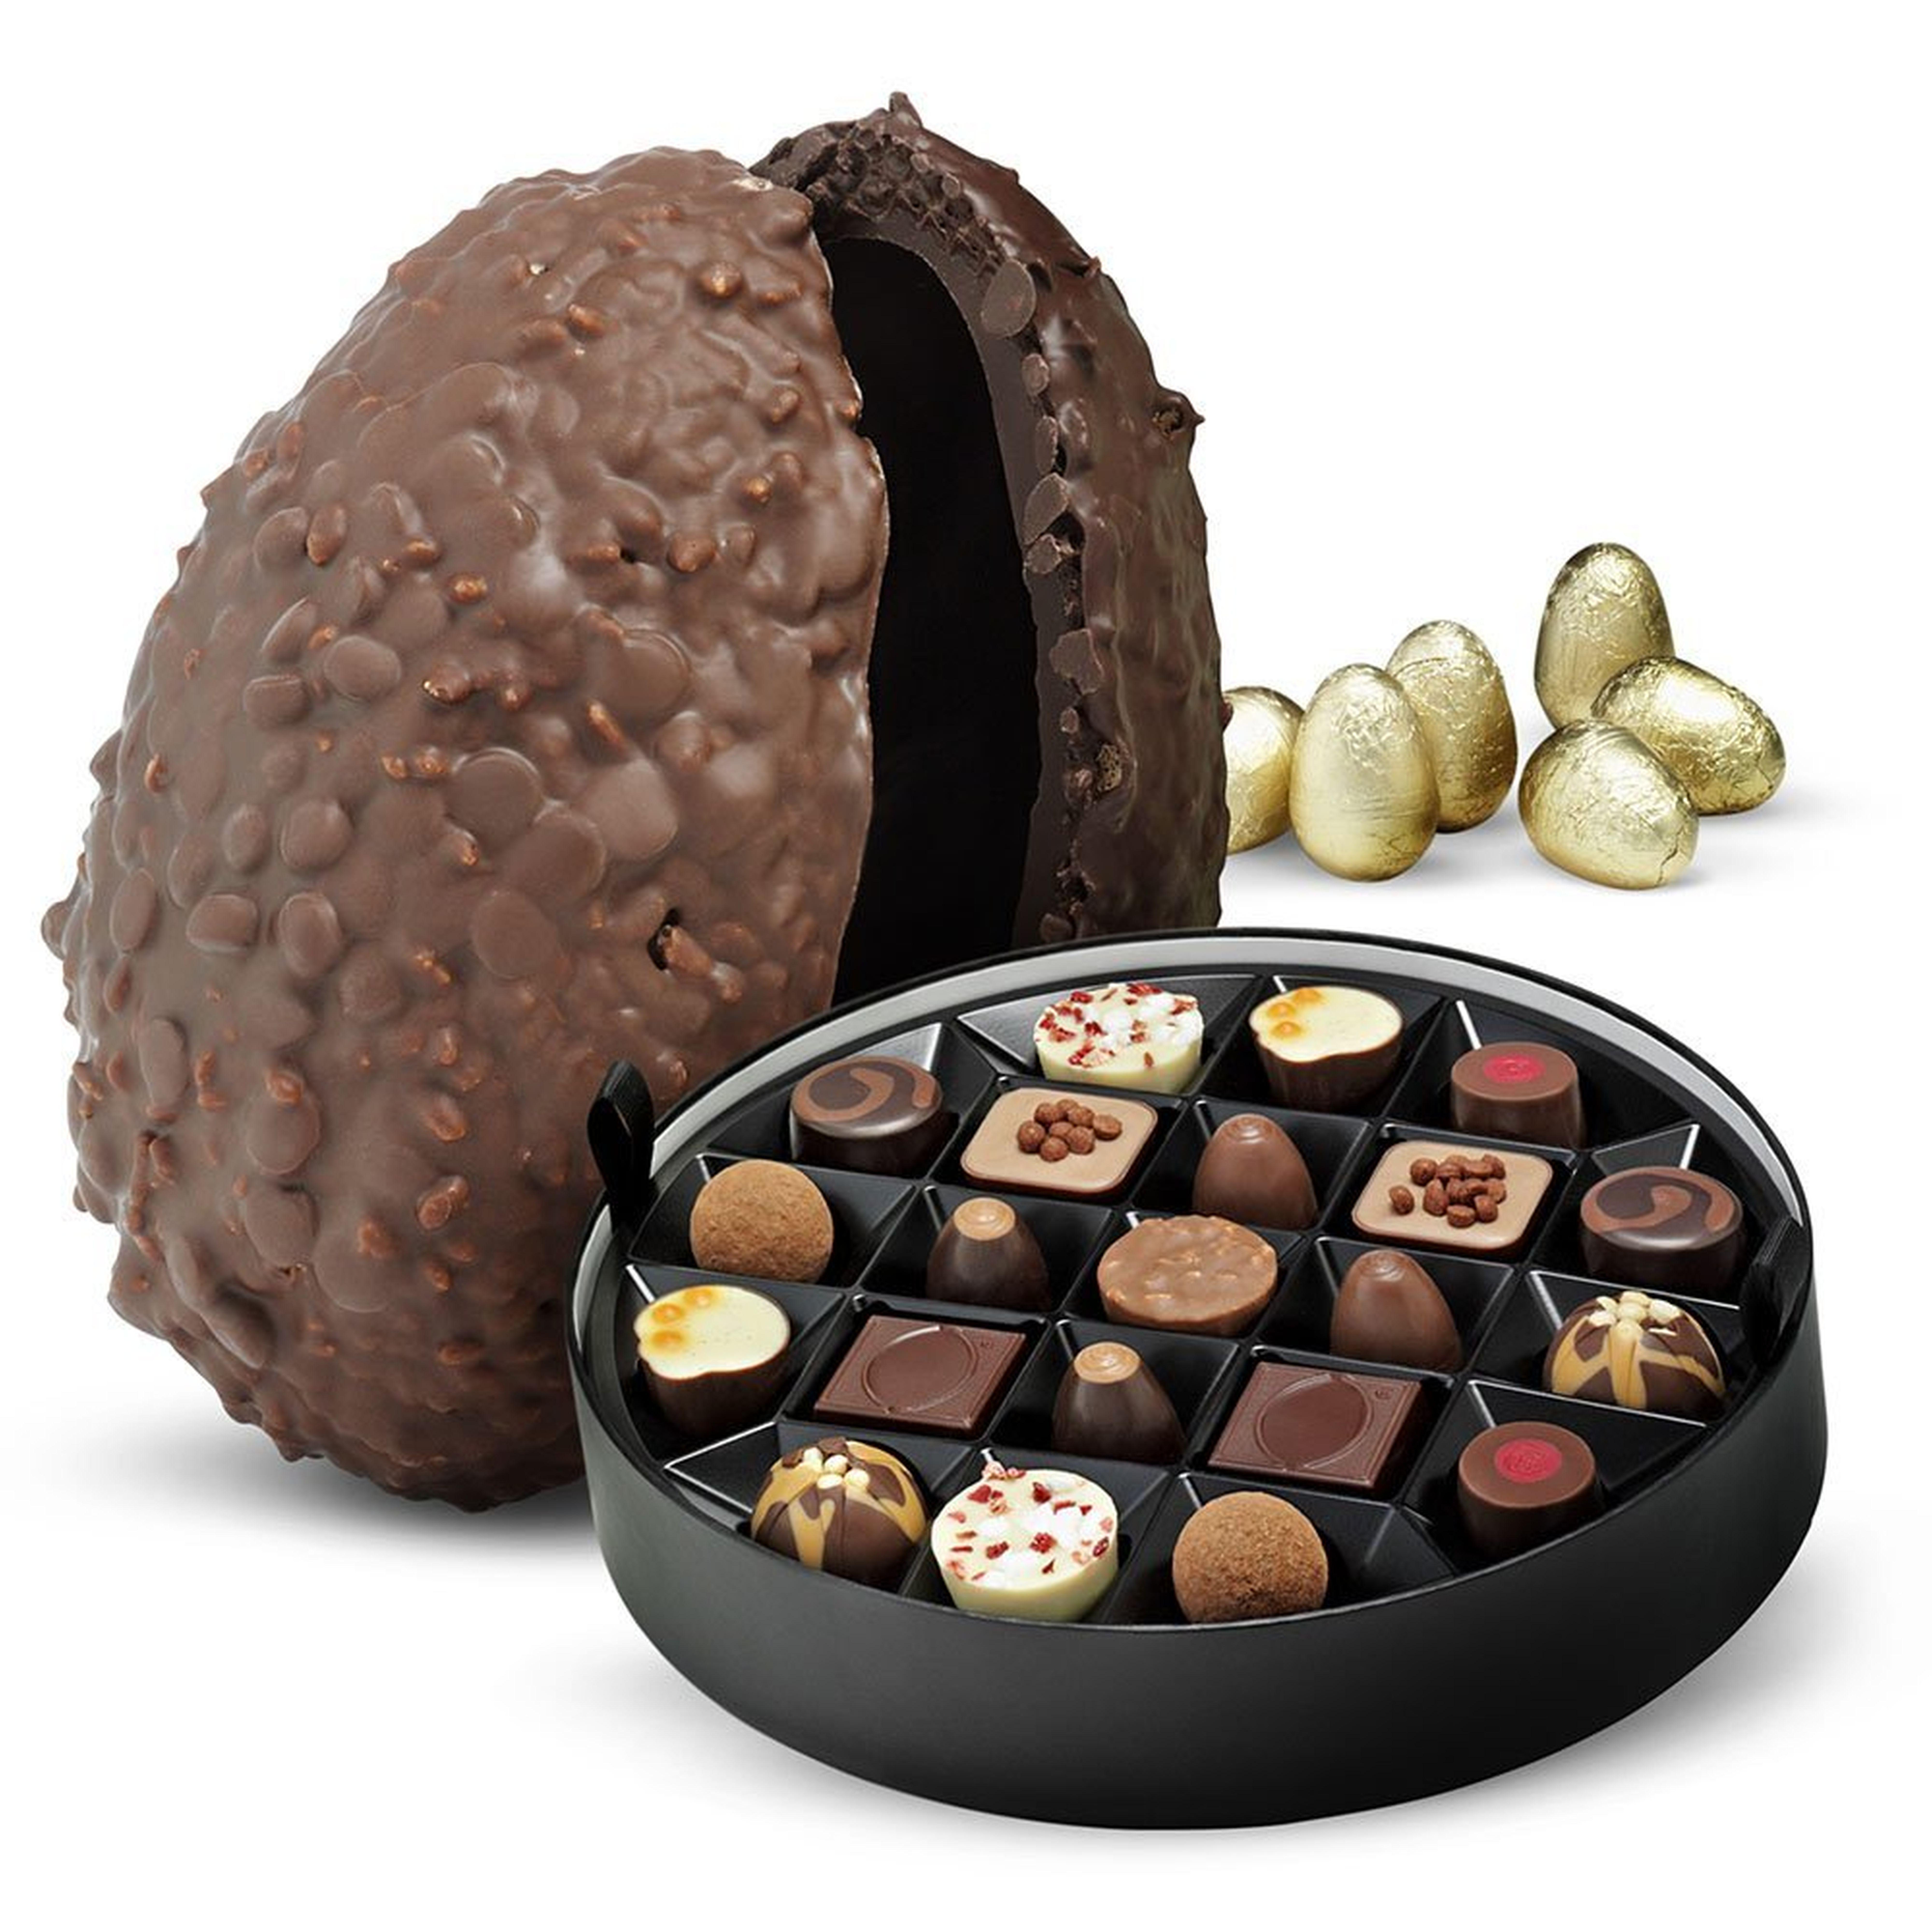 The Solid Chocolate Company Original Chocolate Eggs